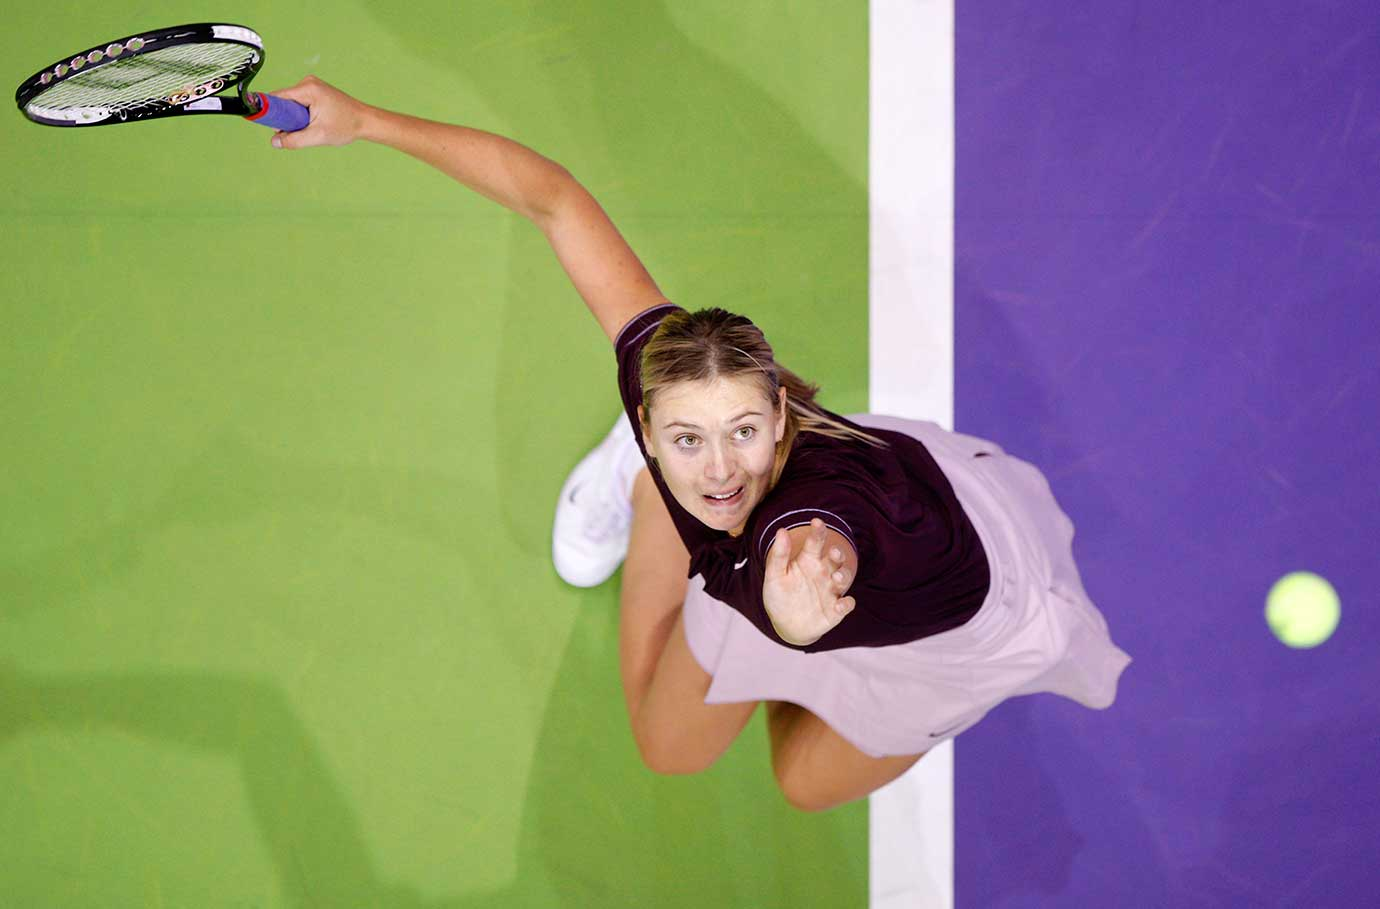 Maria Sharapova serves to Justine Henin at the 2007 Sony Ericsson WTA Tour Championships in Madrid, Spain.